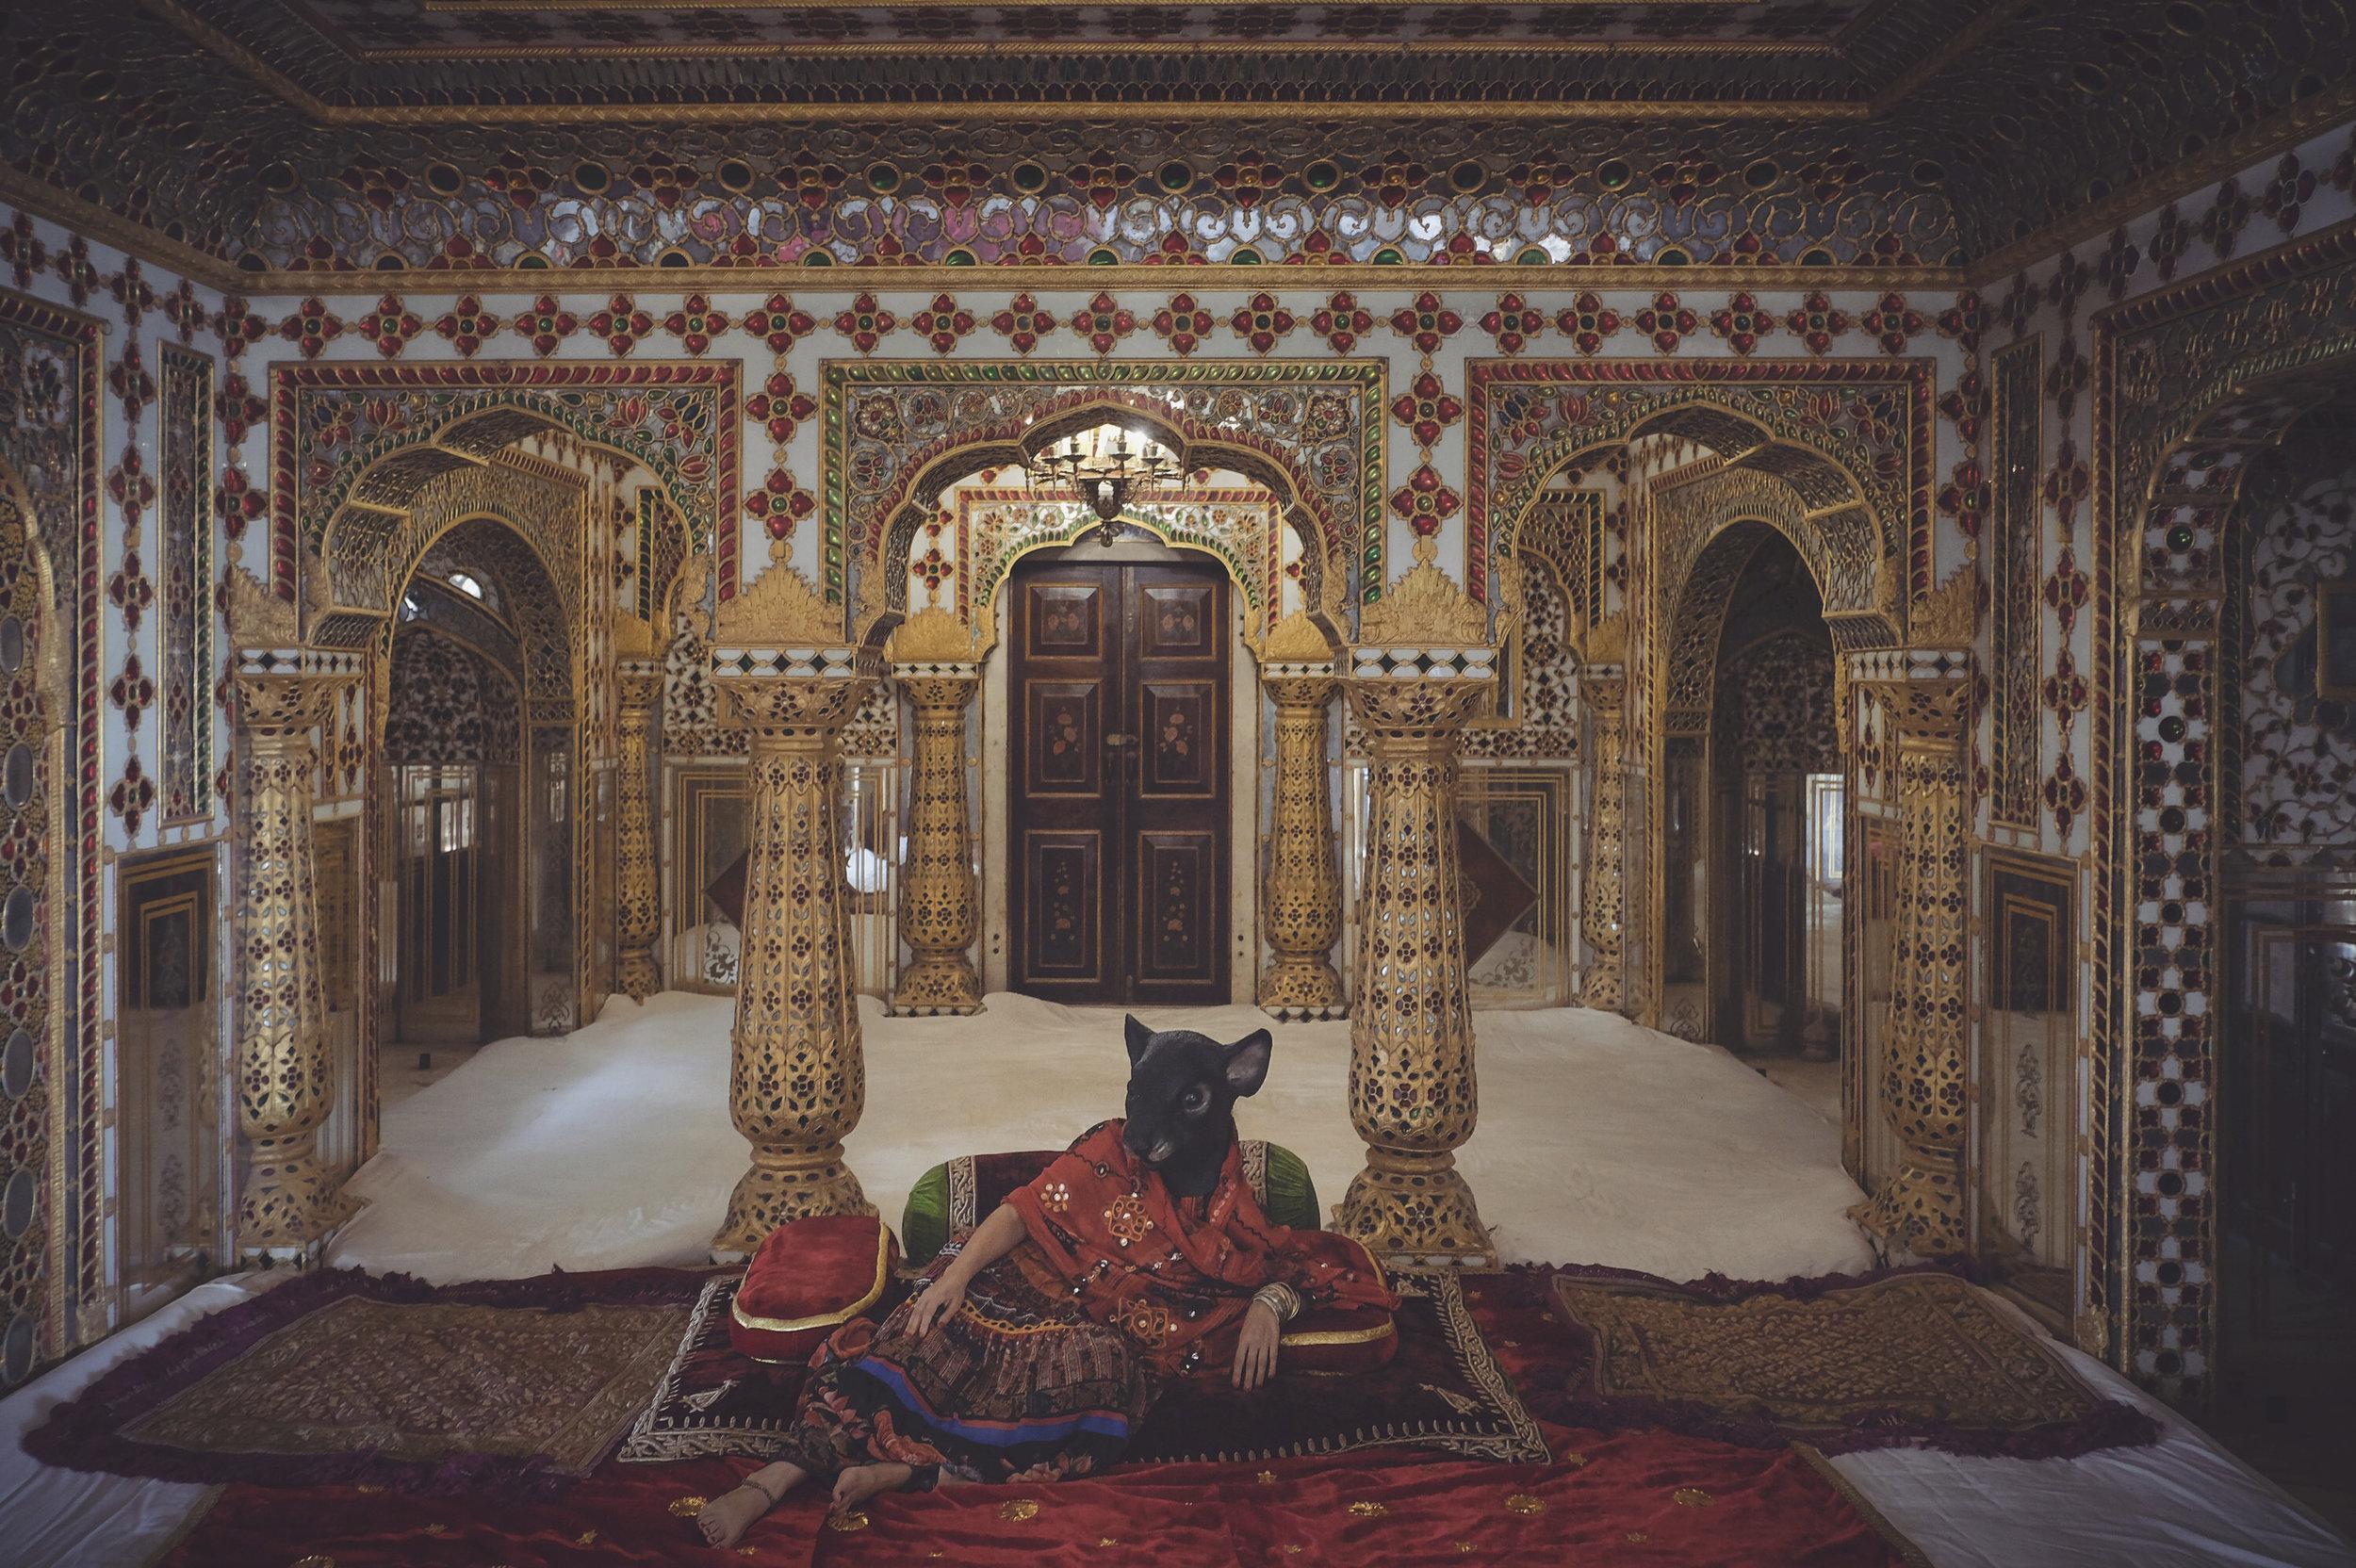 clairerosen_thetravellingmouse_india_jaipur_citypalace6458.jpg